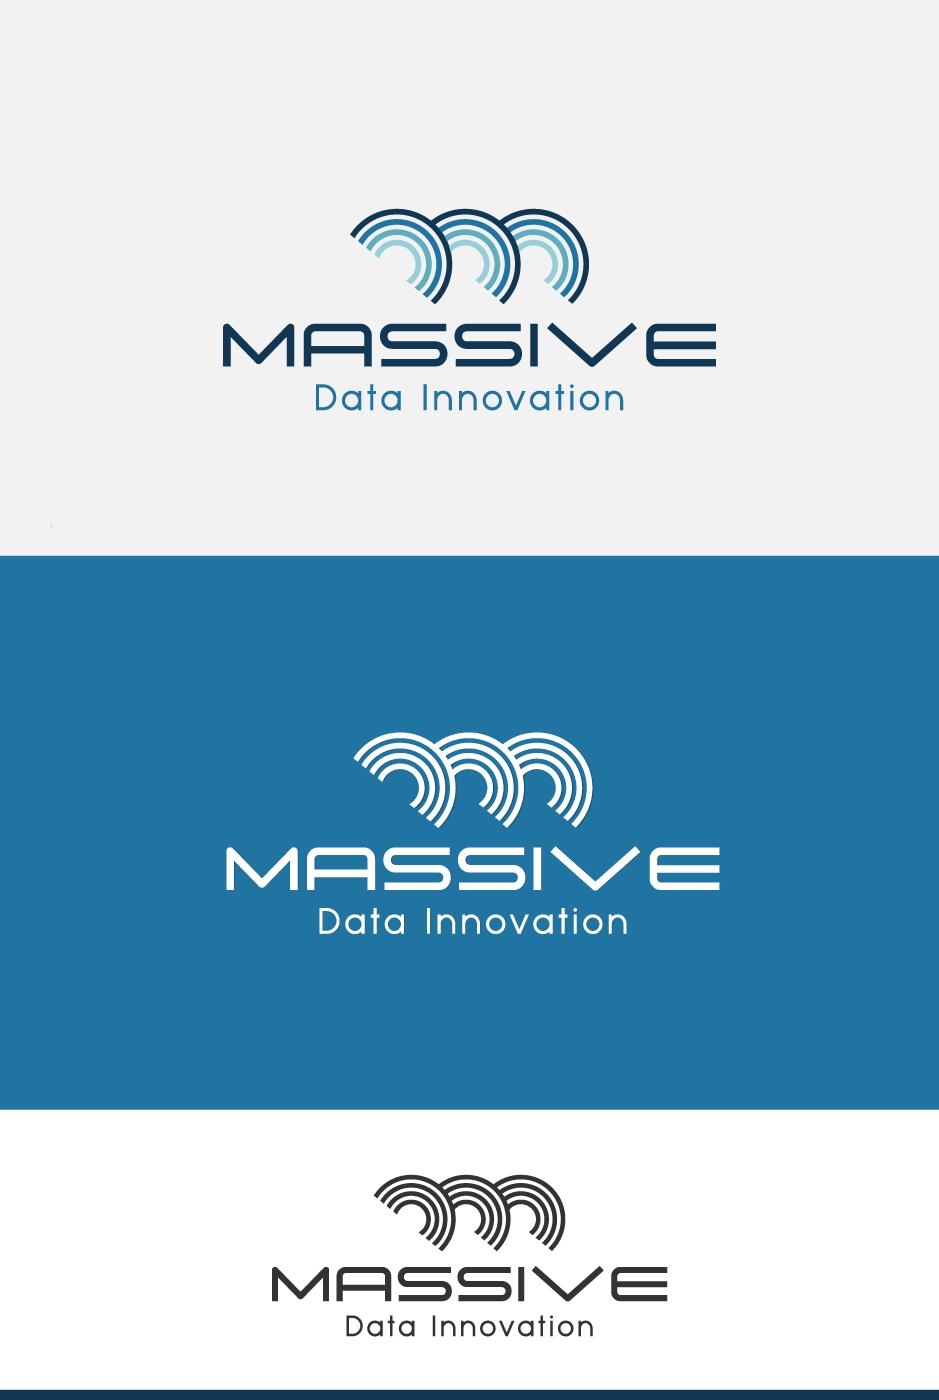 Logo Design by Sami Baig - Entry No. 493 in the Logo Design Contest MASSIVE LOGO.